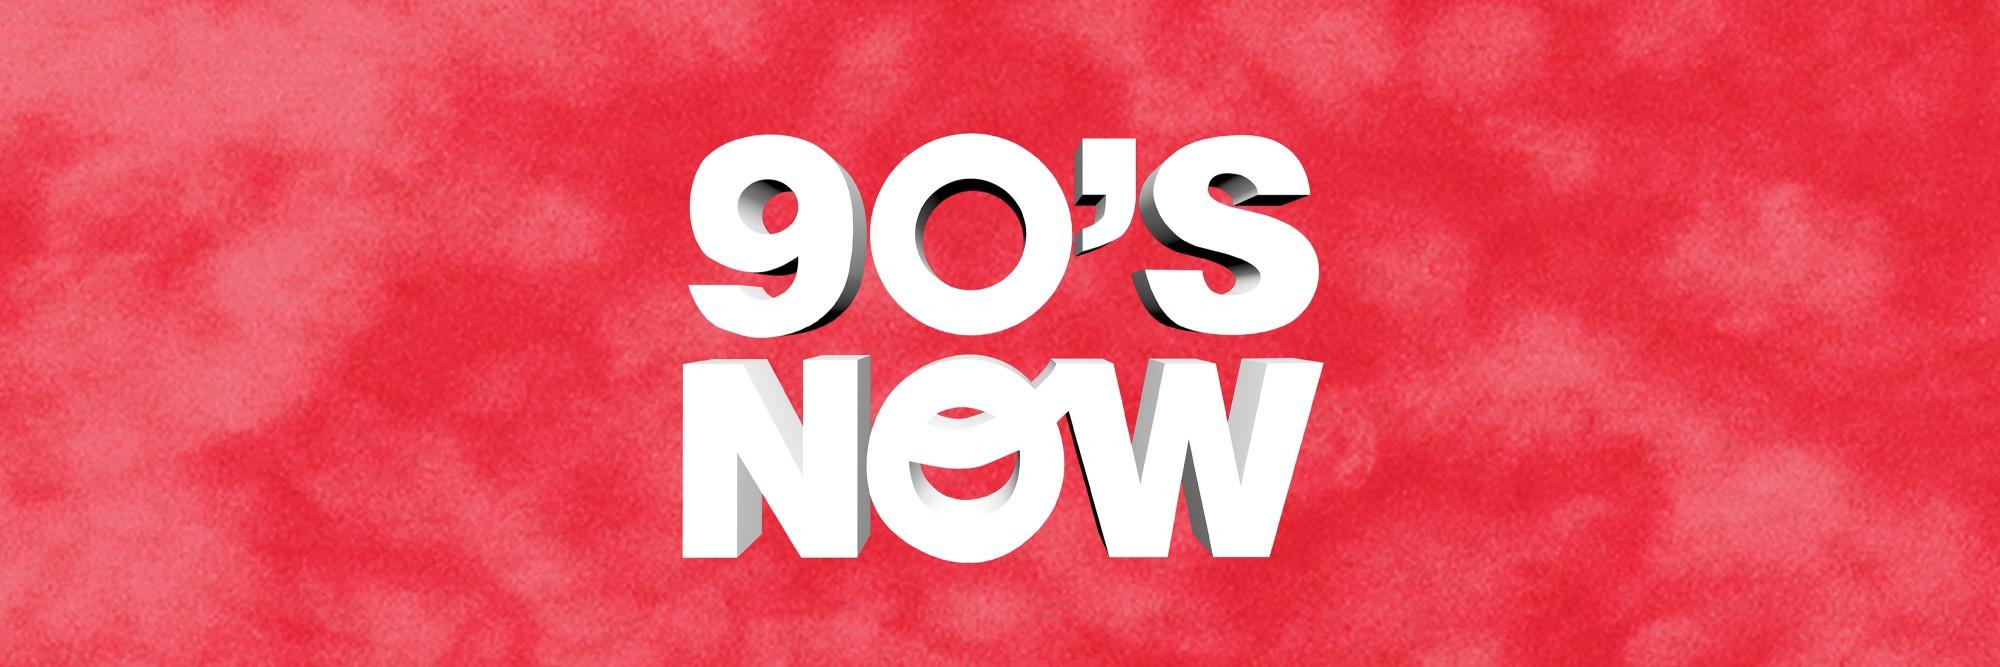 90sNOW-1